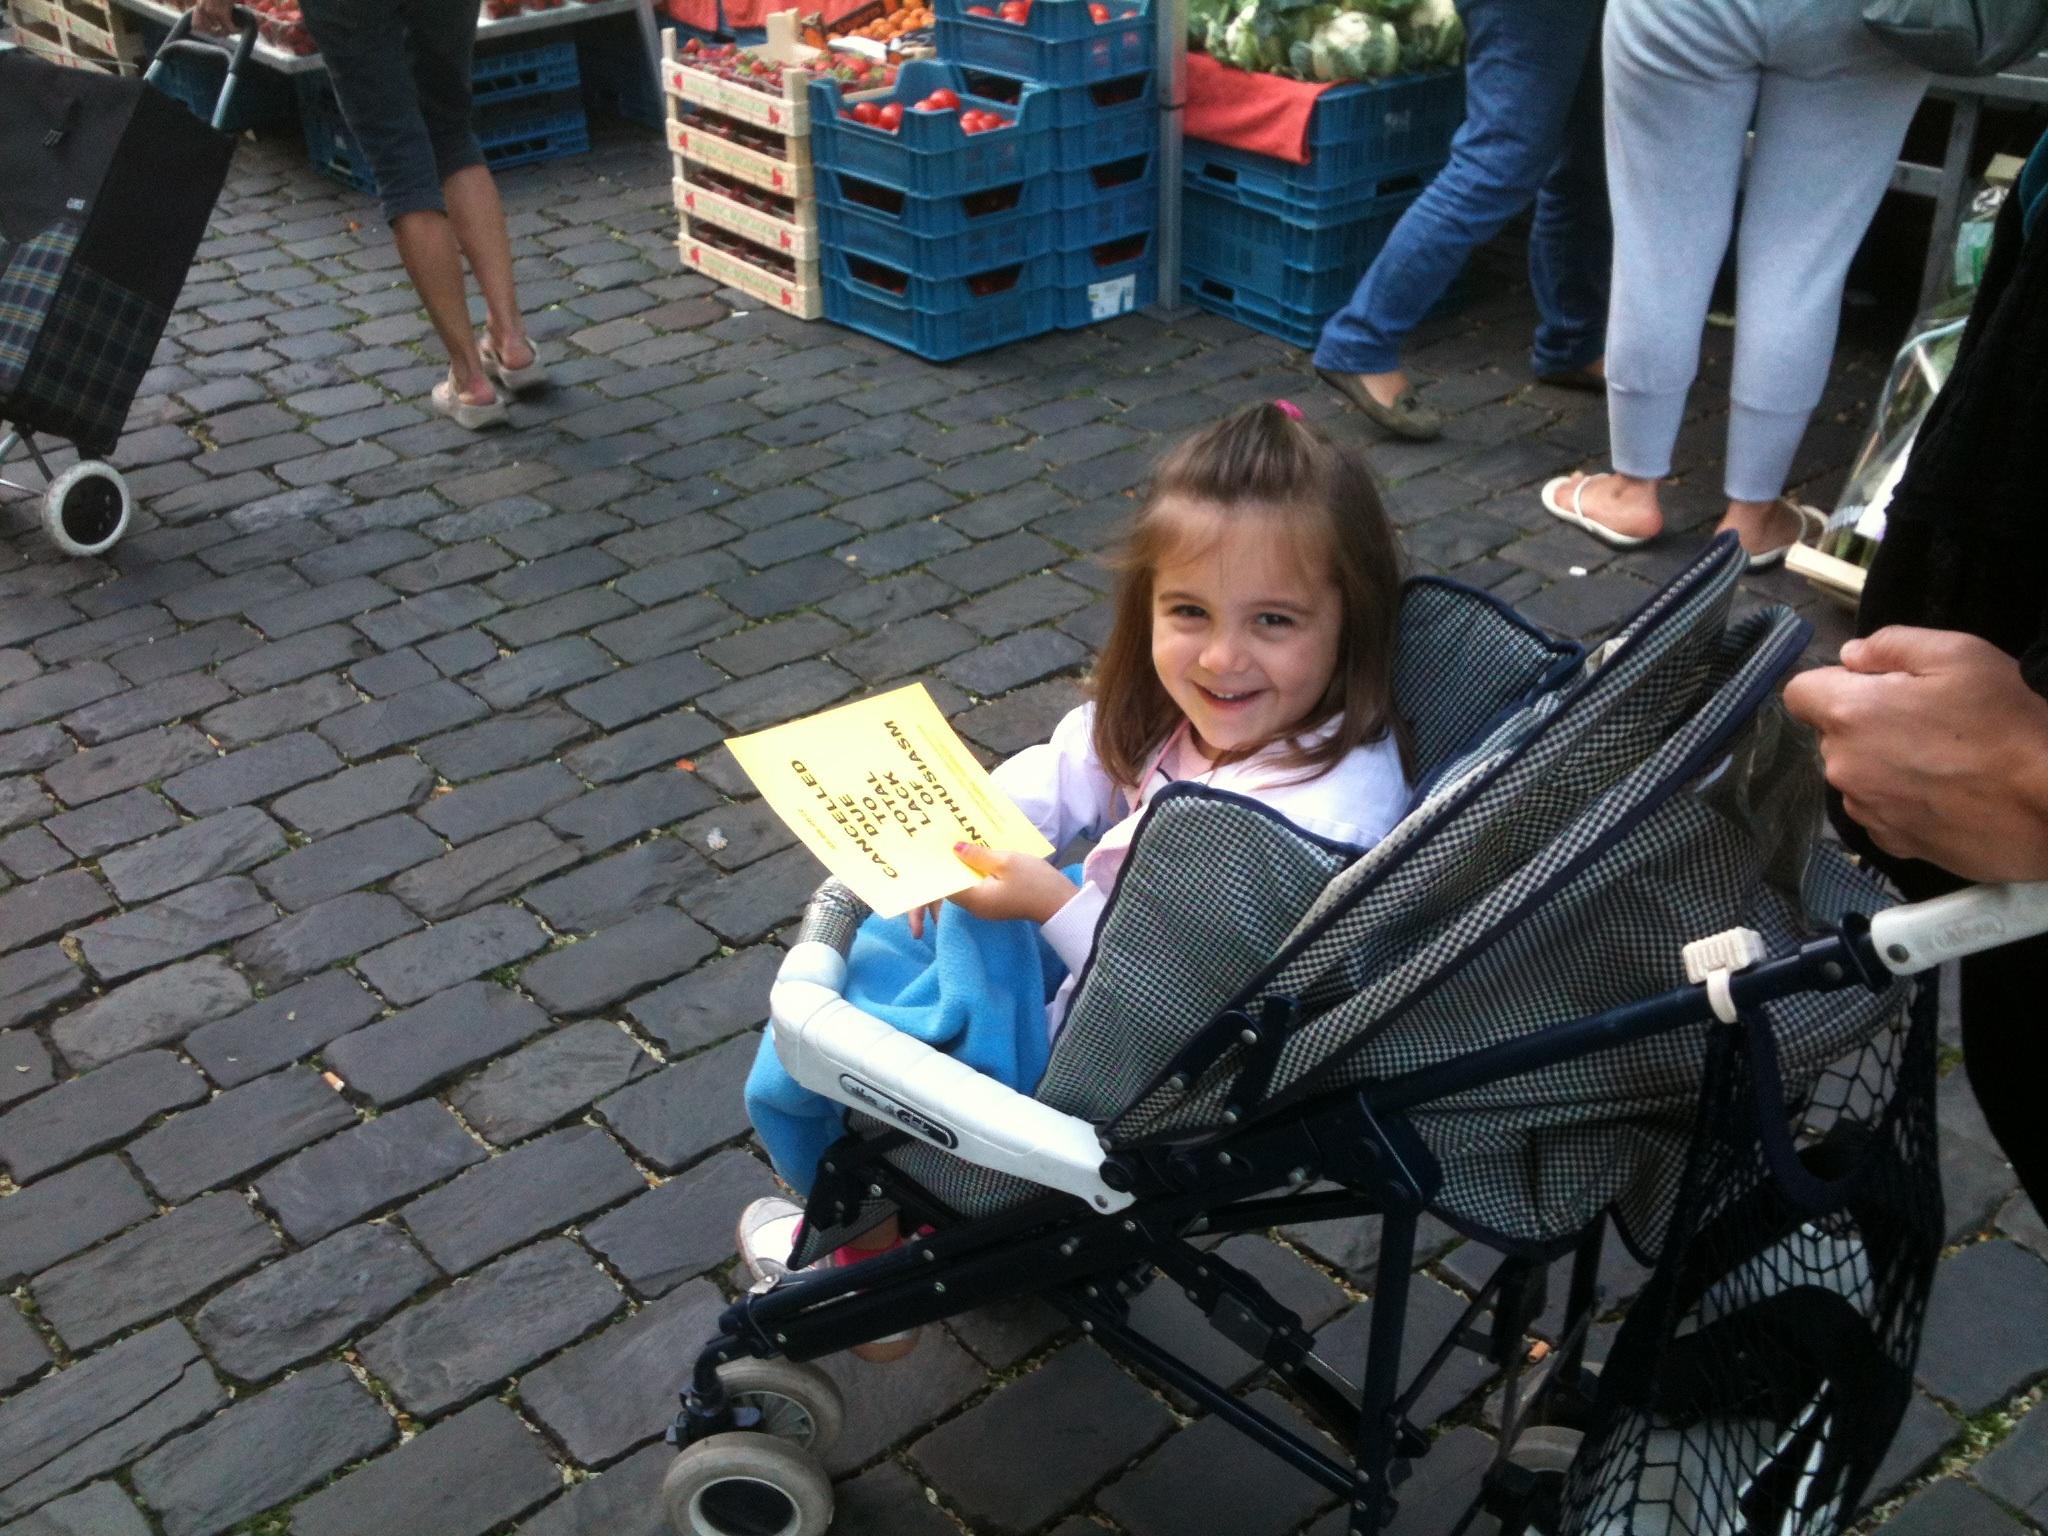 cc-vennerstraat-market-lisa